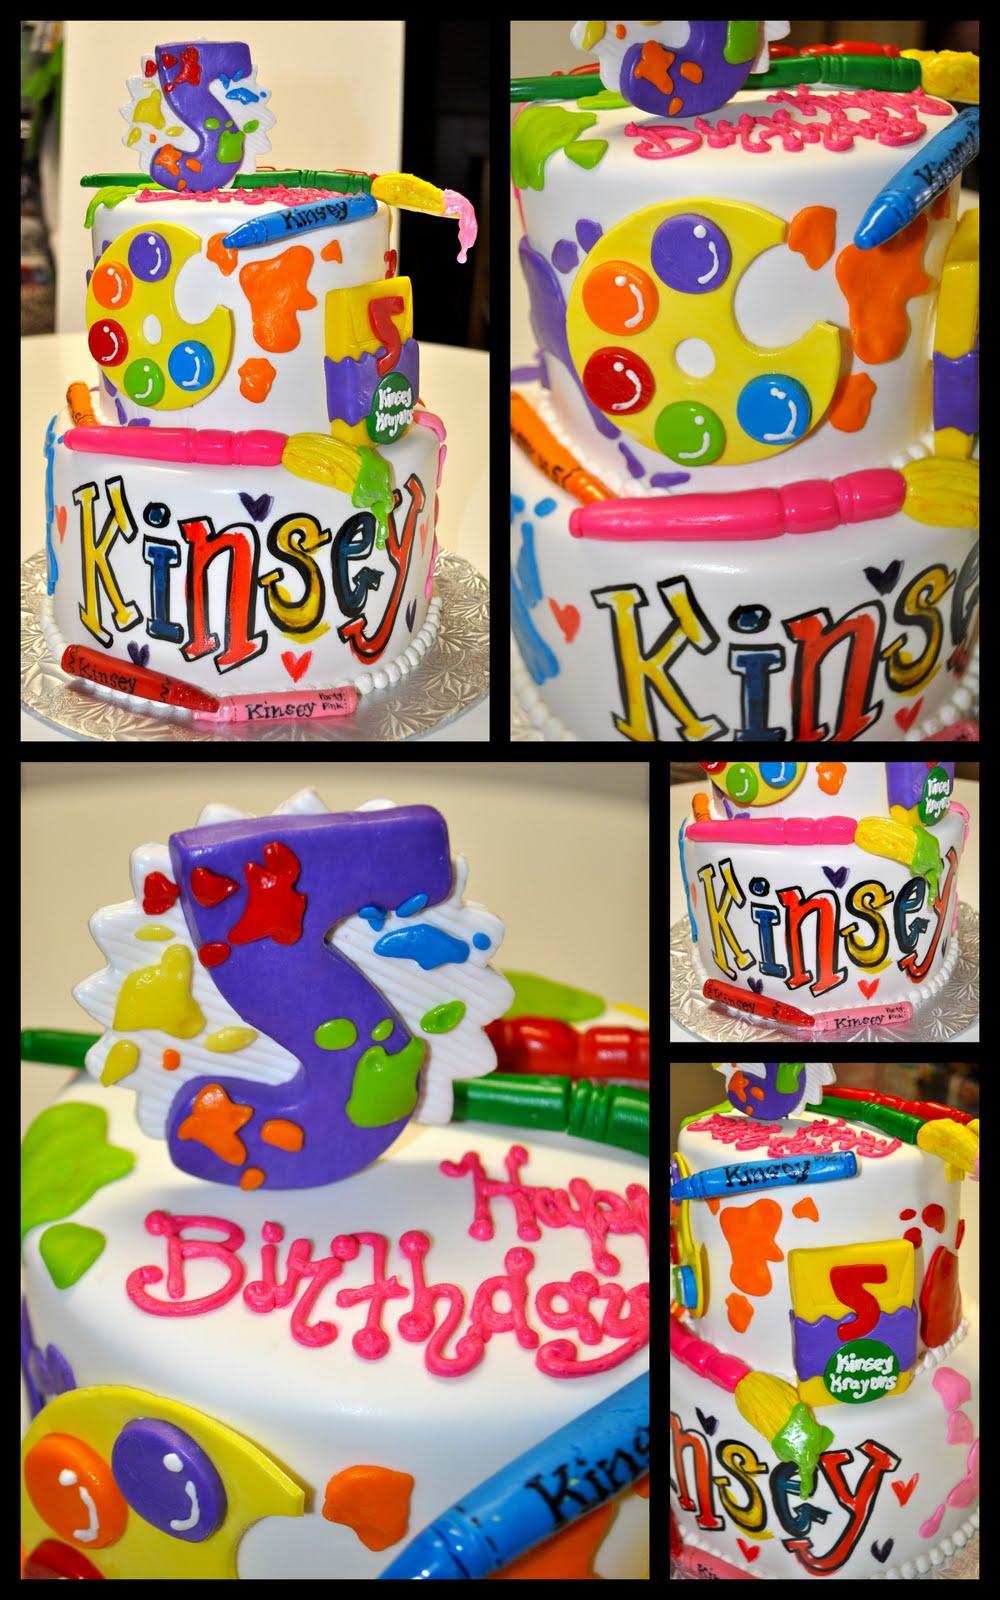 Leah s Sweet Treats: Art Party Cake